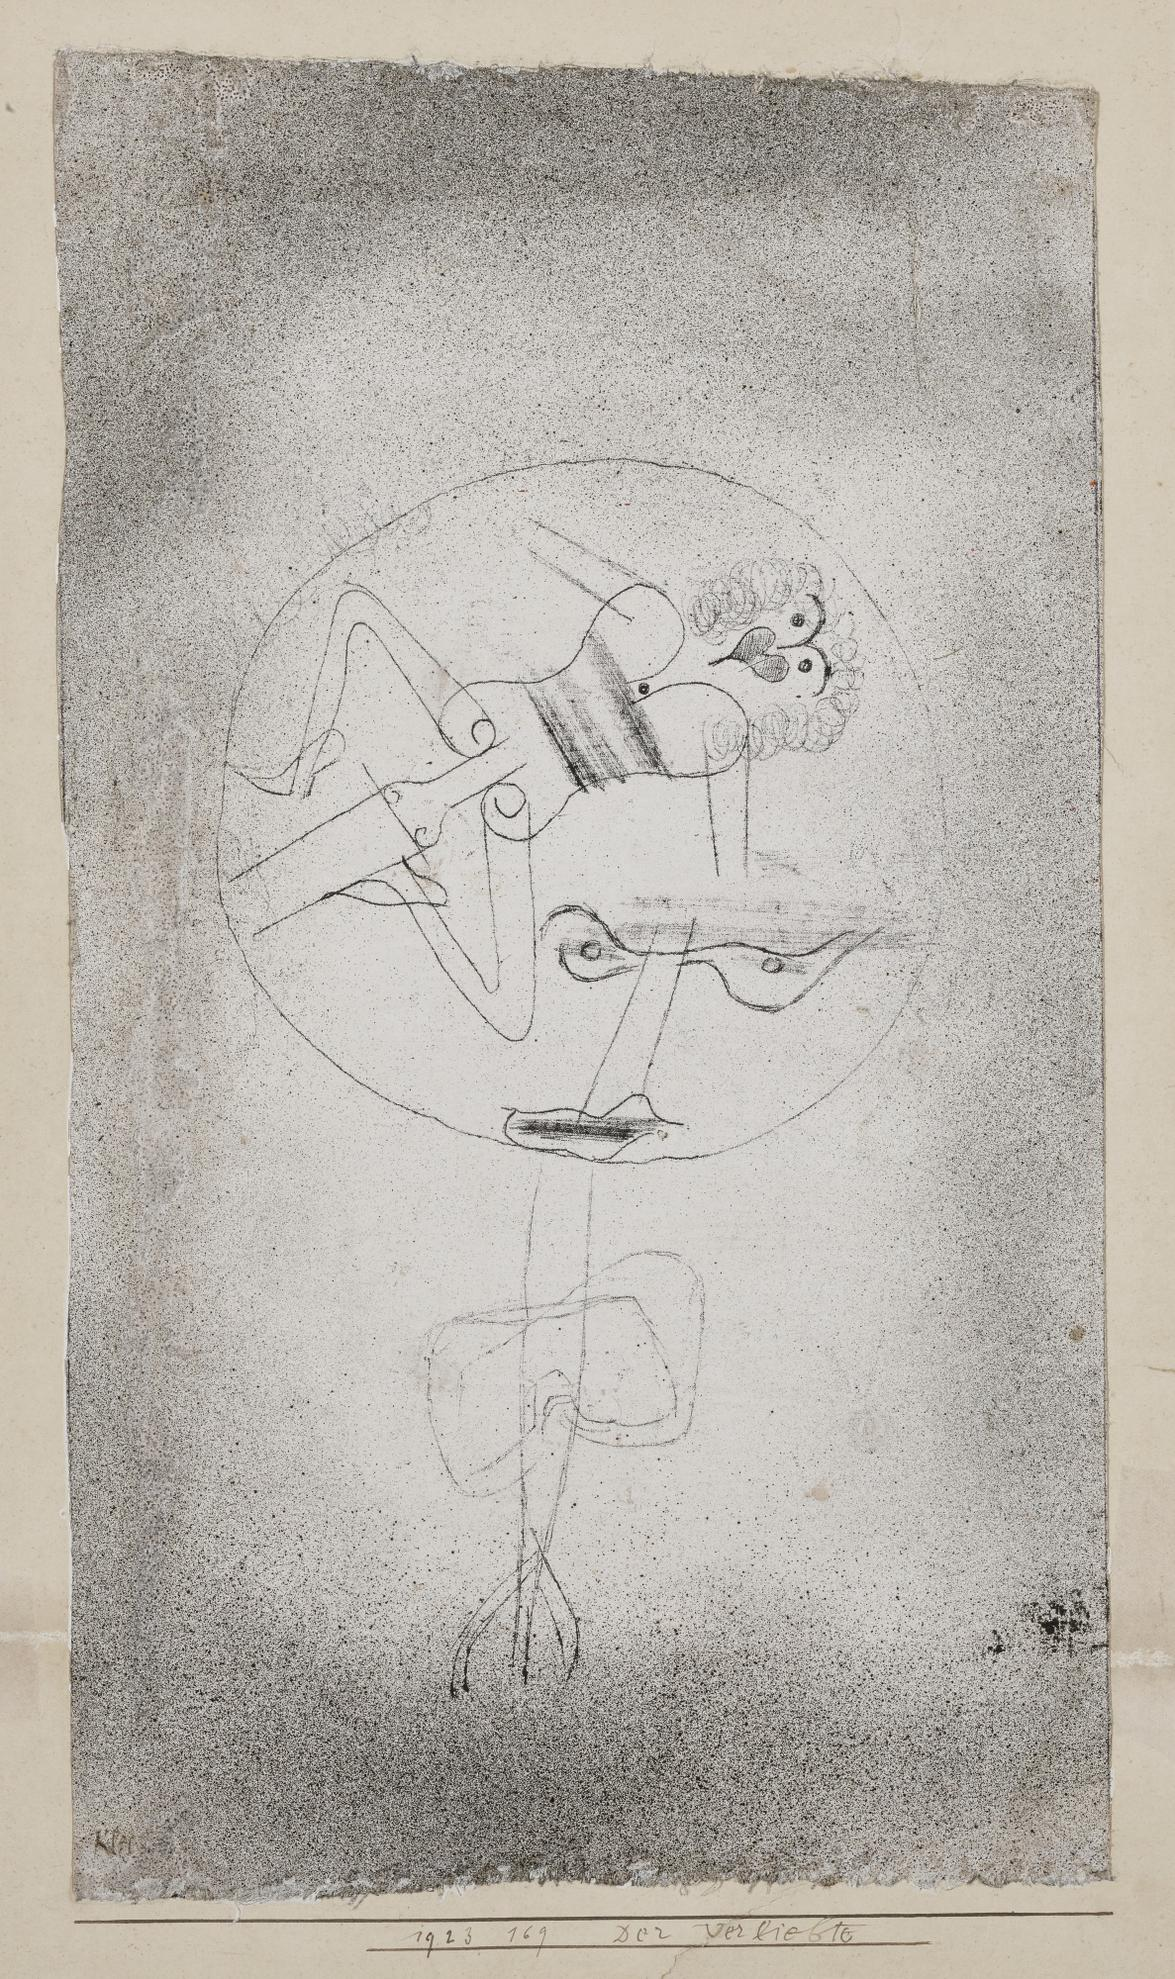 Paul Klee-Der Verliebte (The Man In Love)-1923